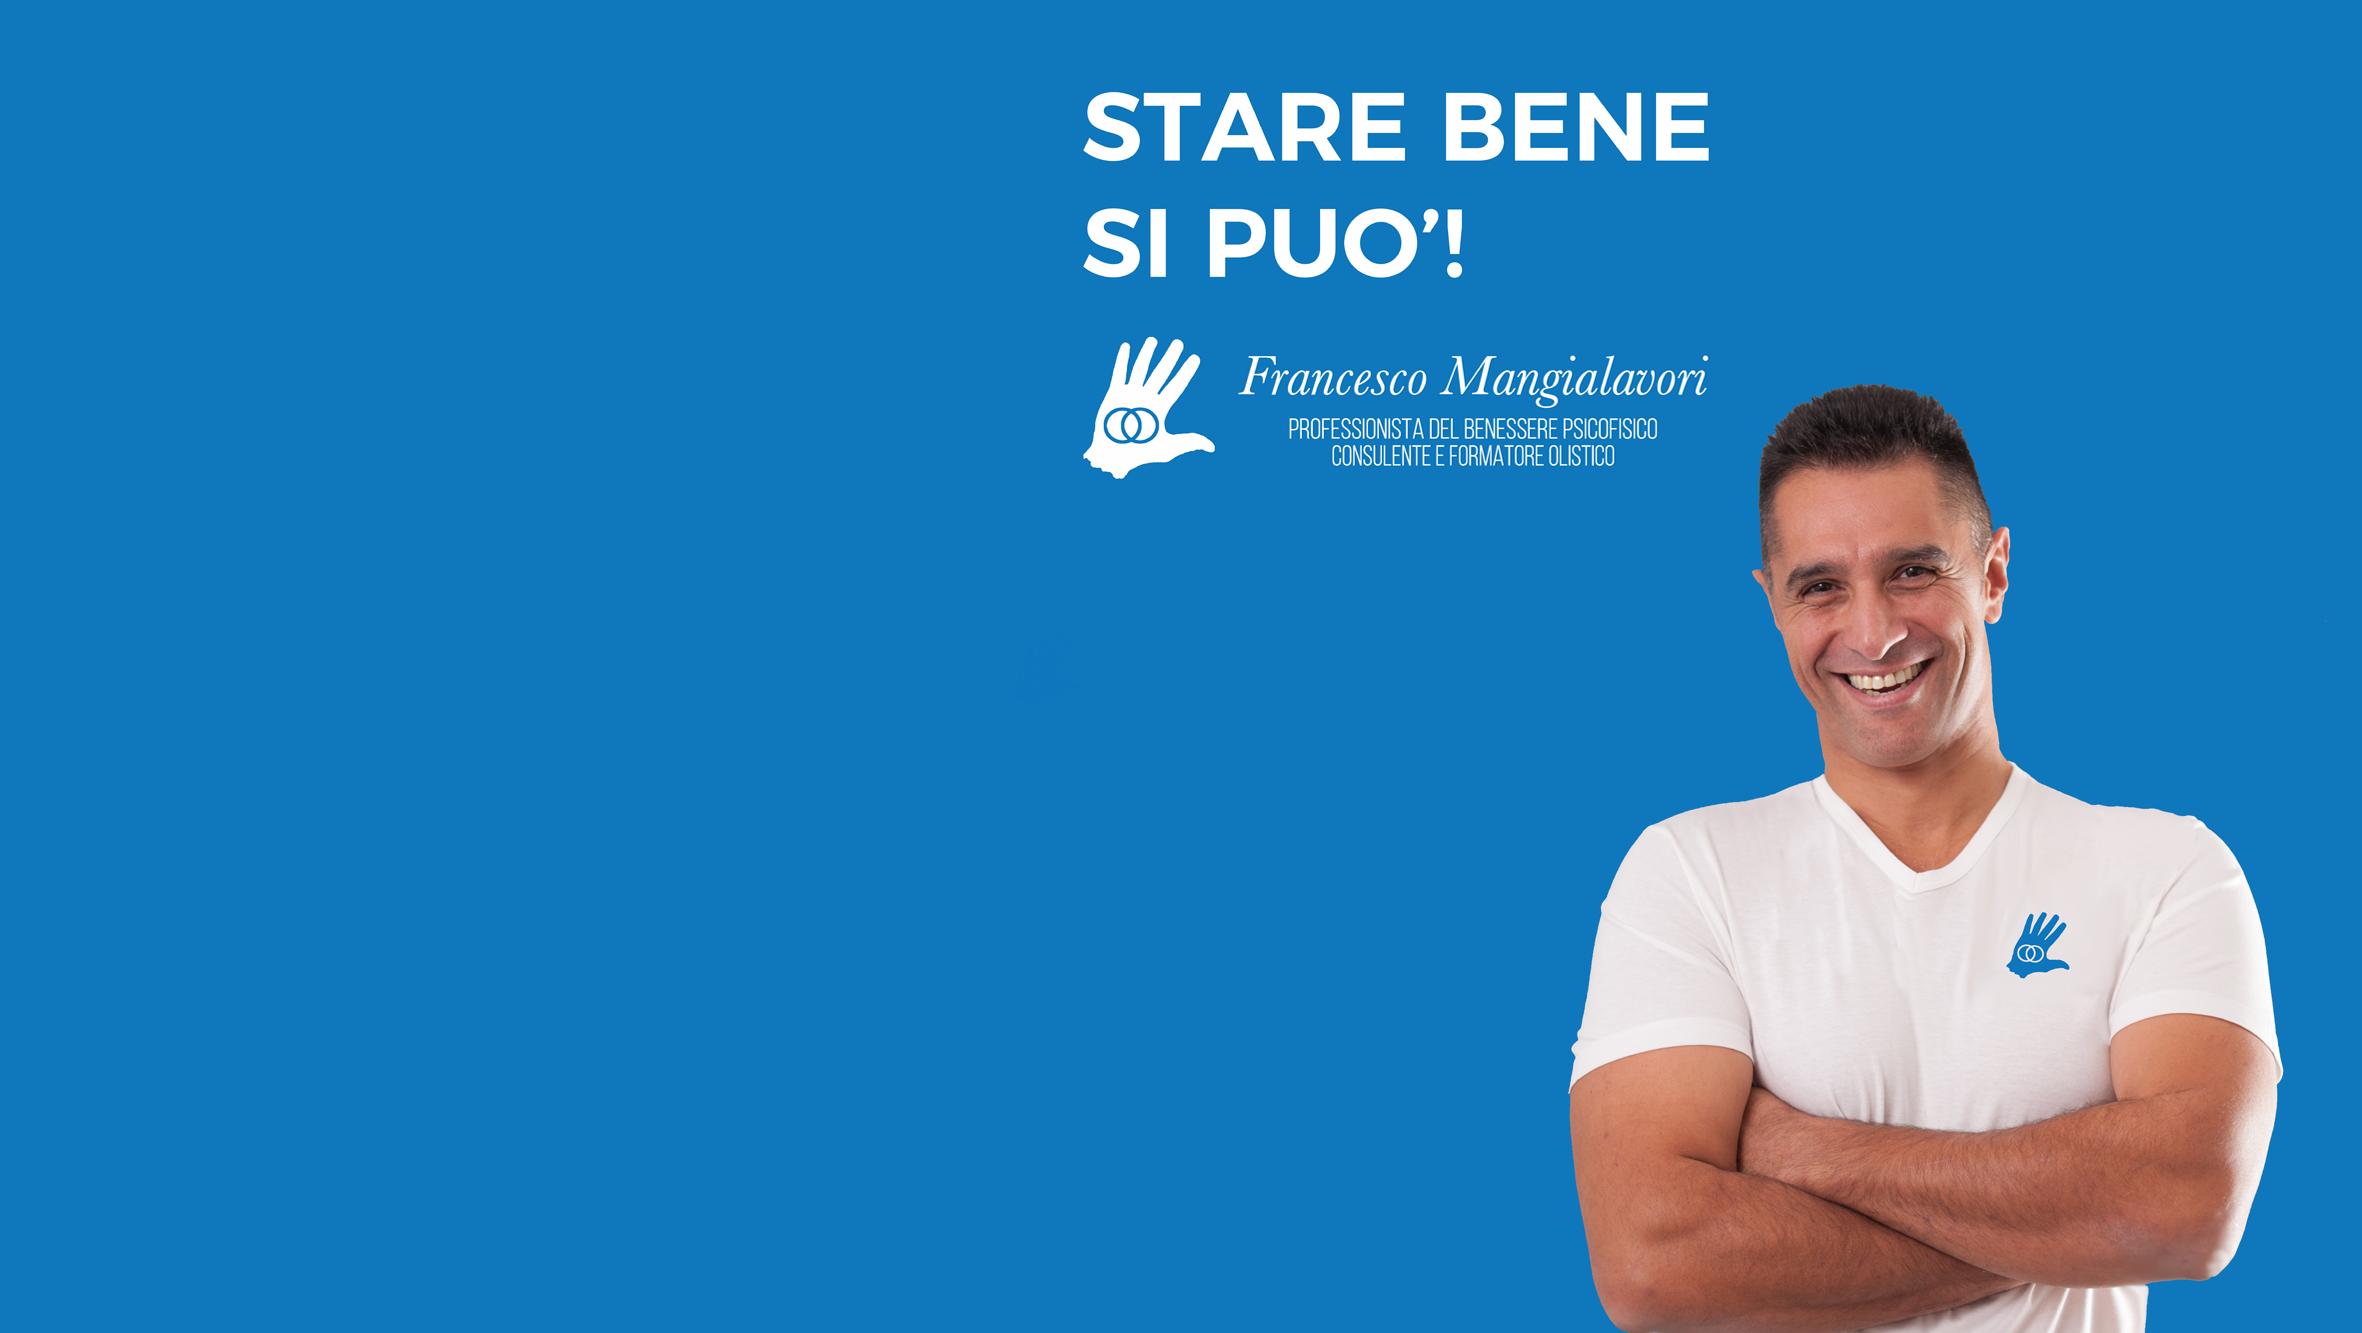 francesco mangialavori banner.png